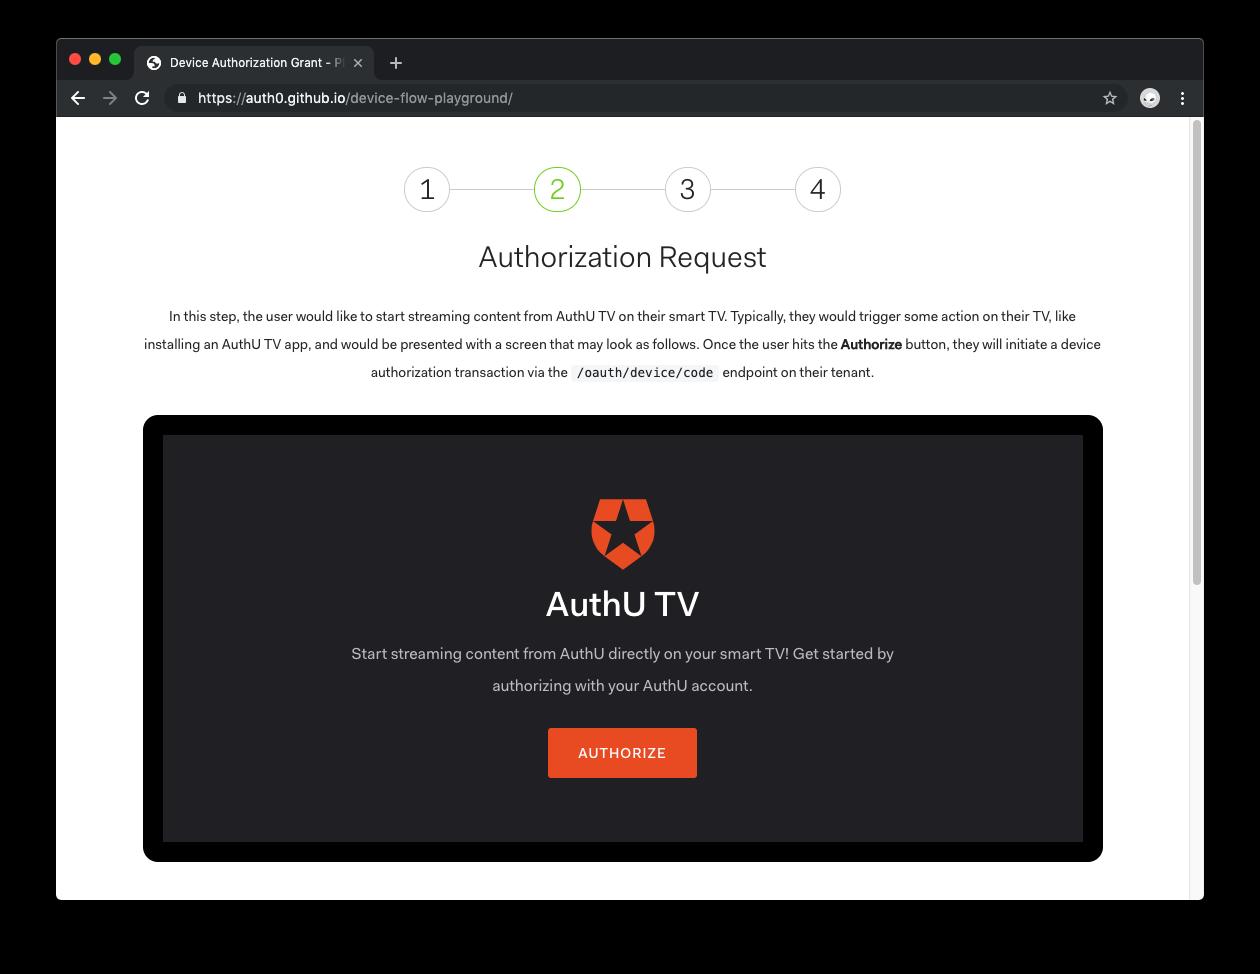 Auth0 Device Flow:認証リクエスト